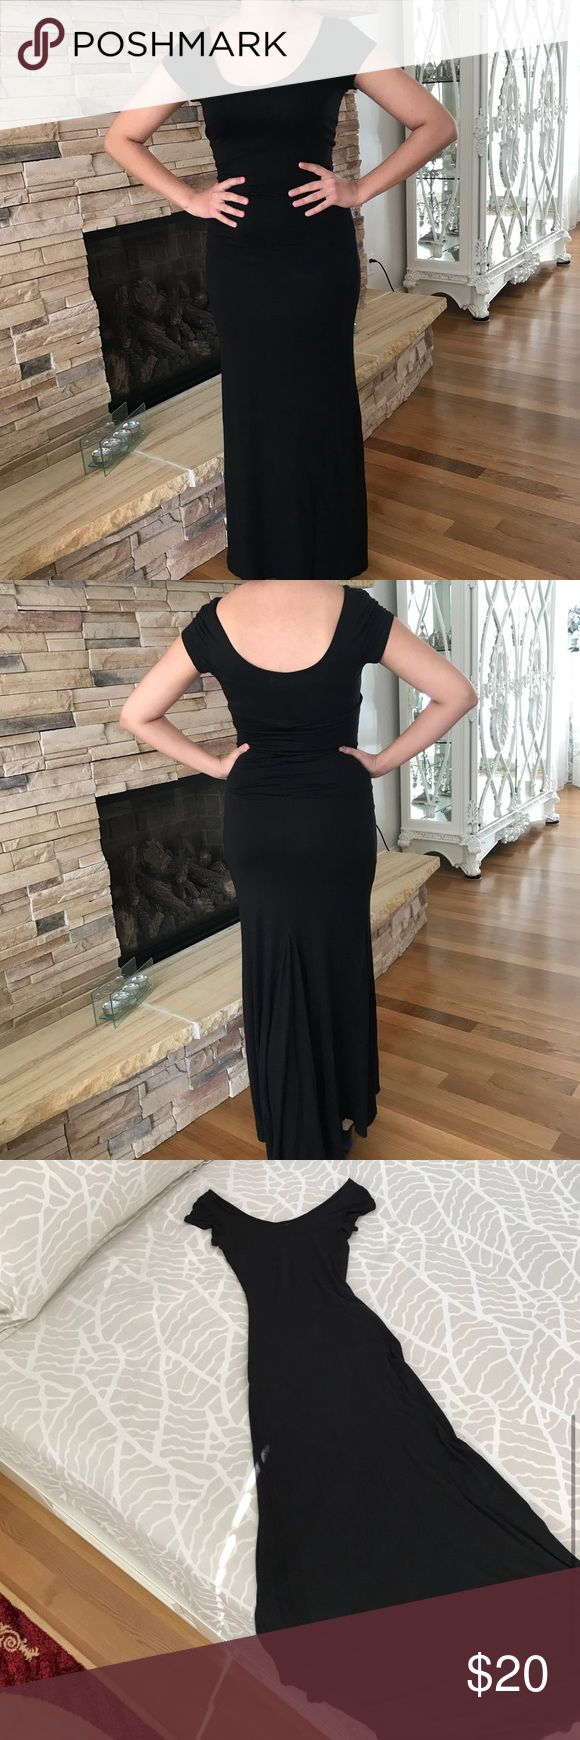 Maxi dress Tight maxi drsss can be used off the shoulder Dresses Maxi